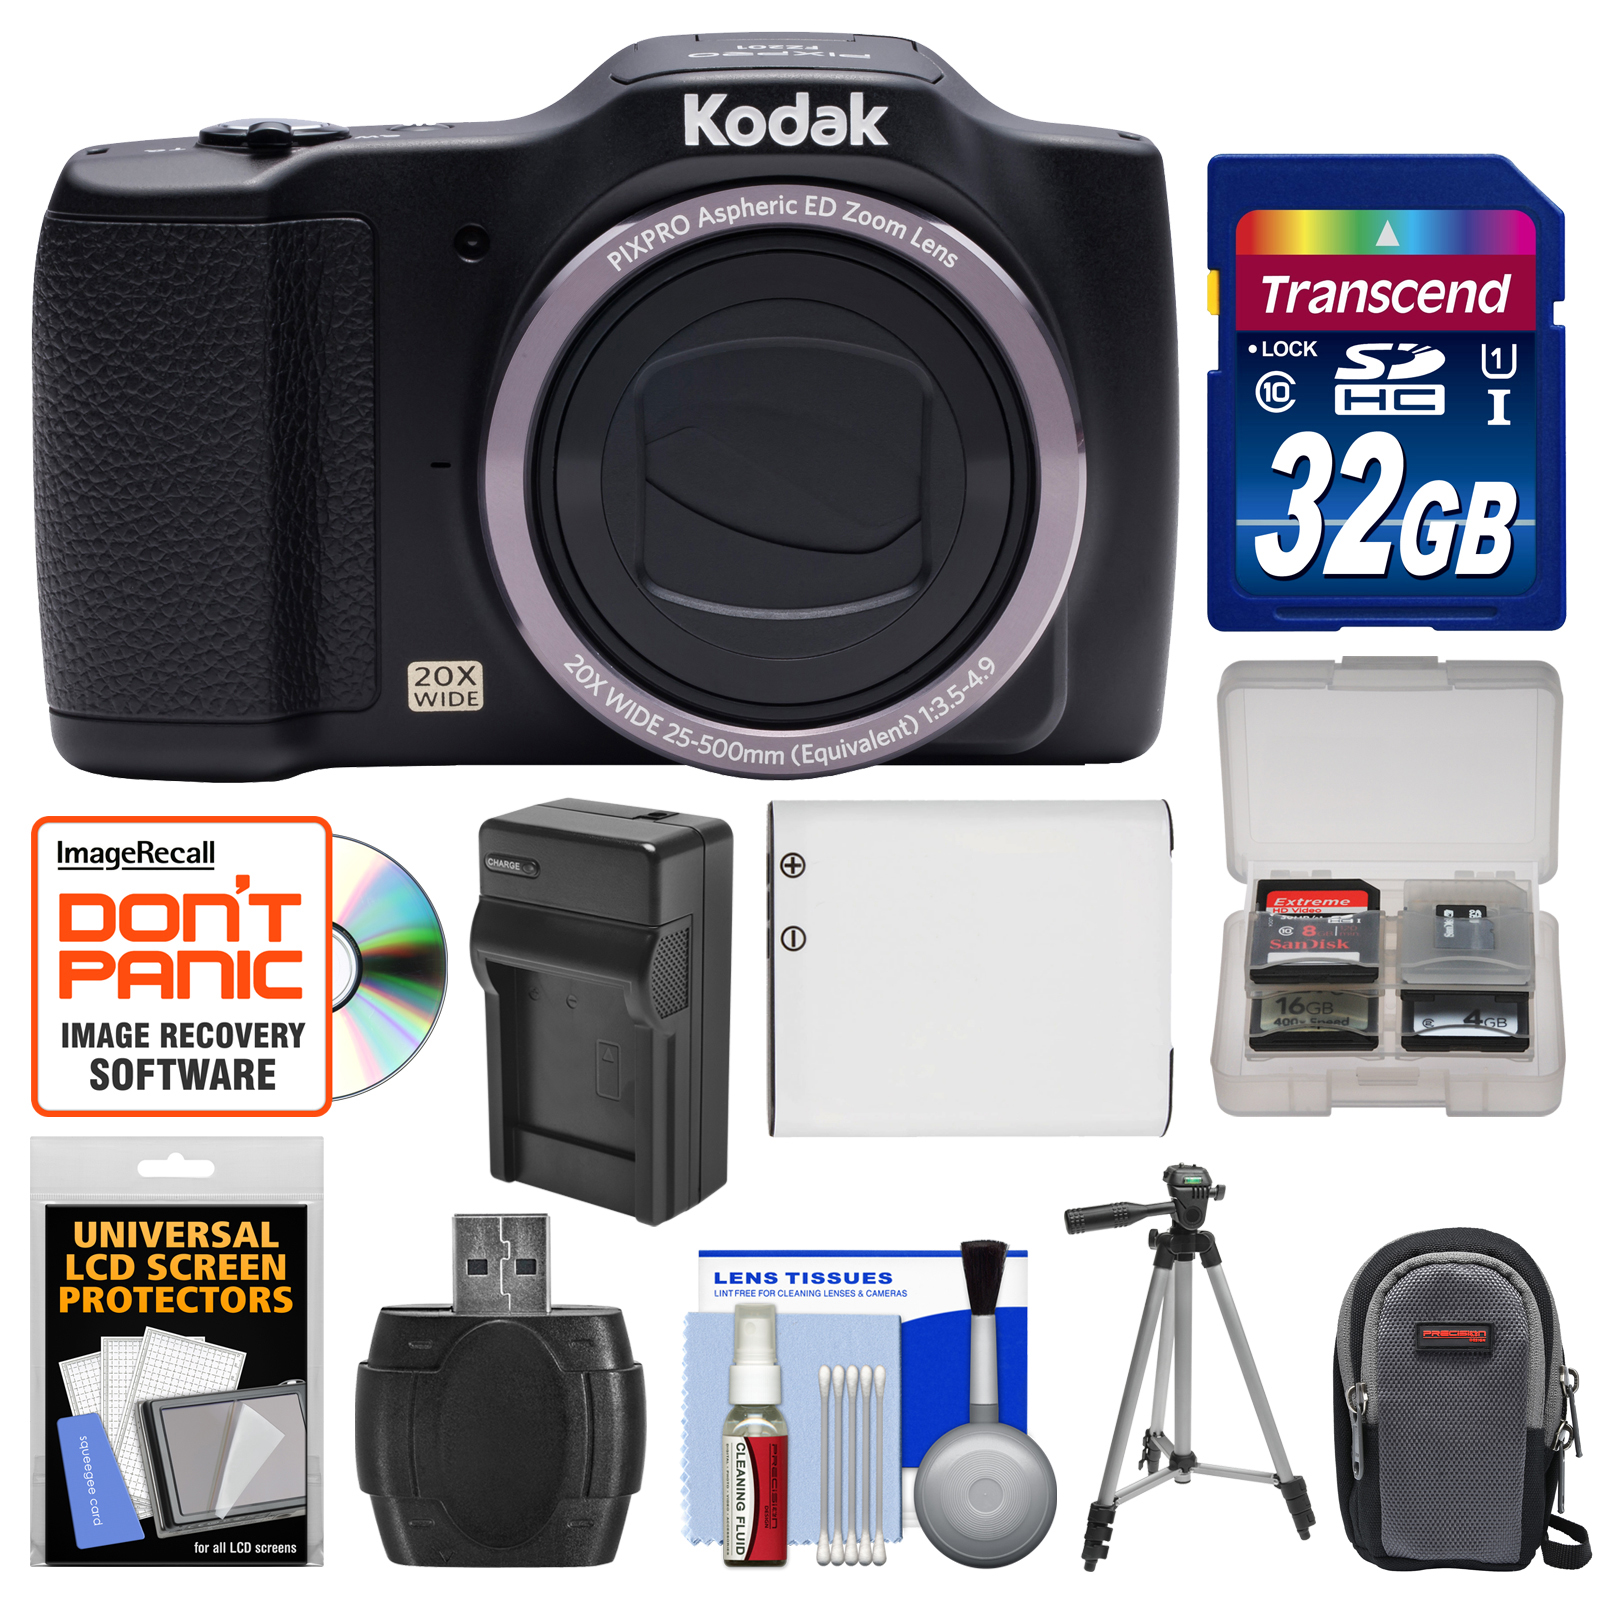 Kodak PixPro Friendly Zoom FZ201 Digital Camera with 32GB Card + Case + Battery & Charger + Tripod + Kit by Kodak